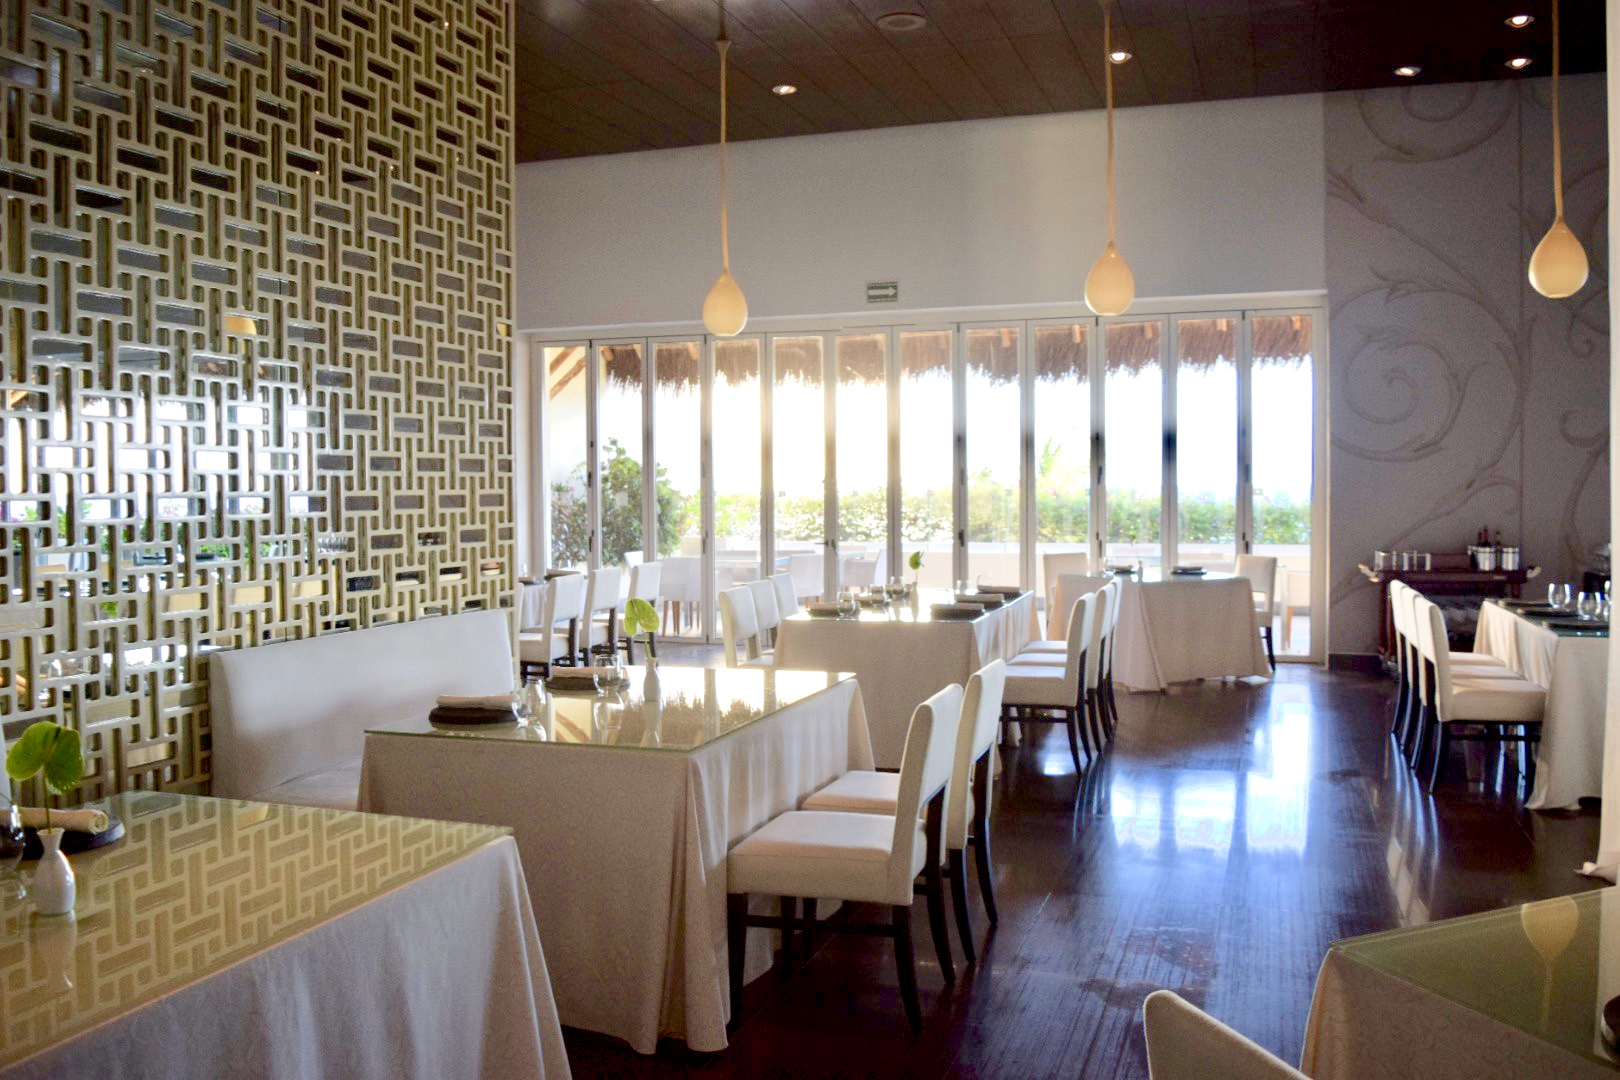 Cocina de Autor at the Grand Class | Grand Velas Riviera Maya